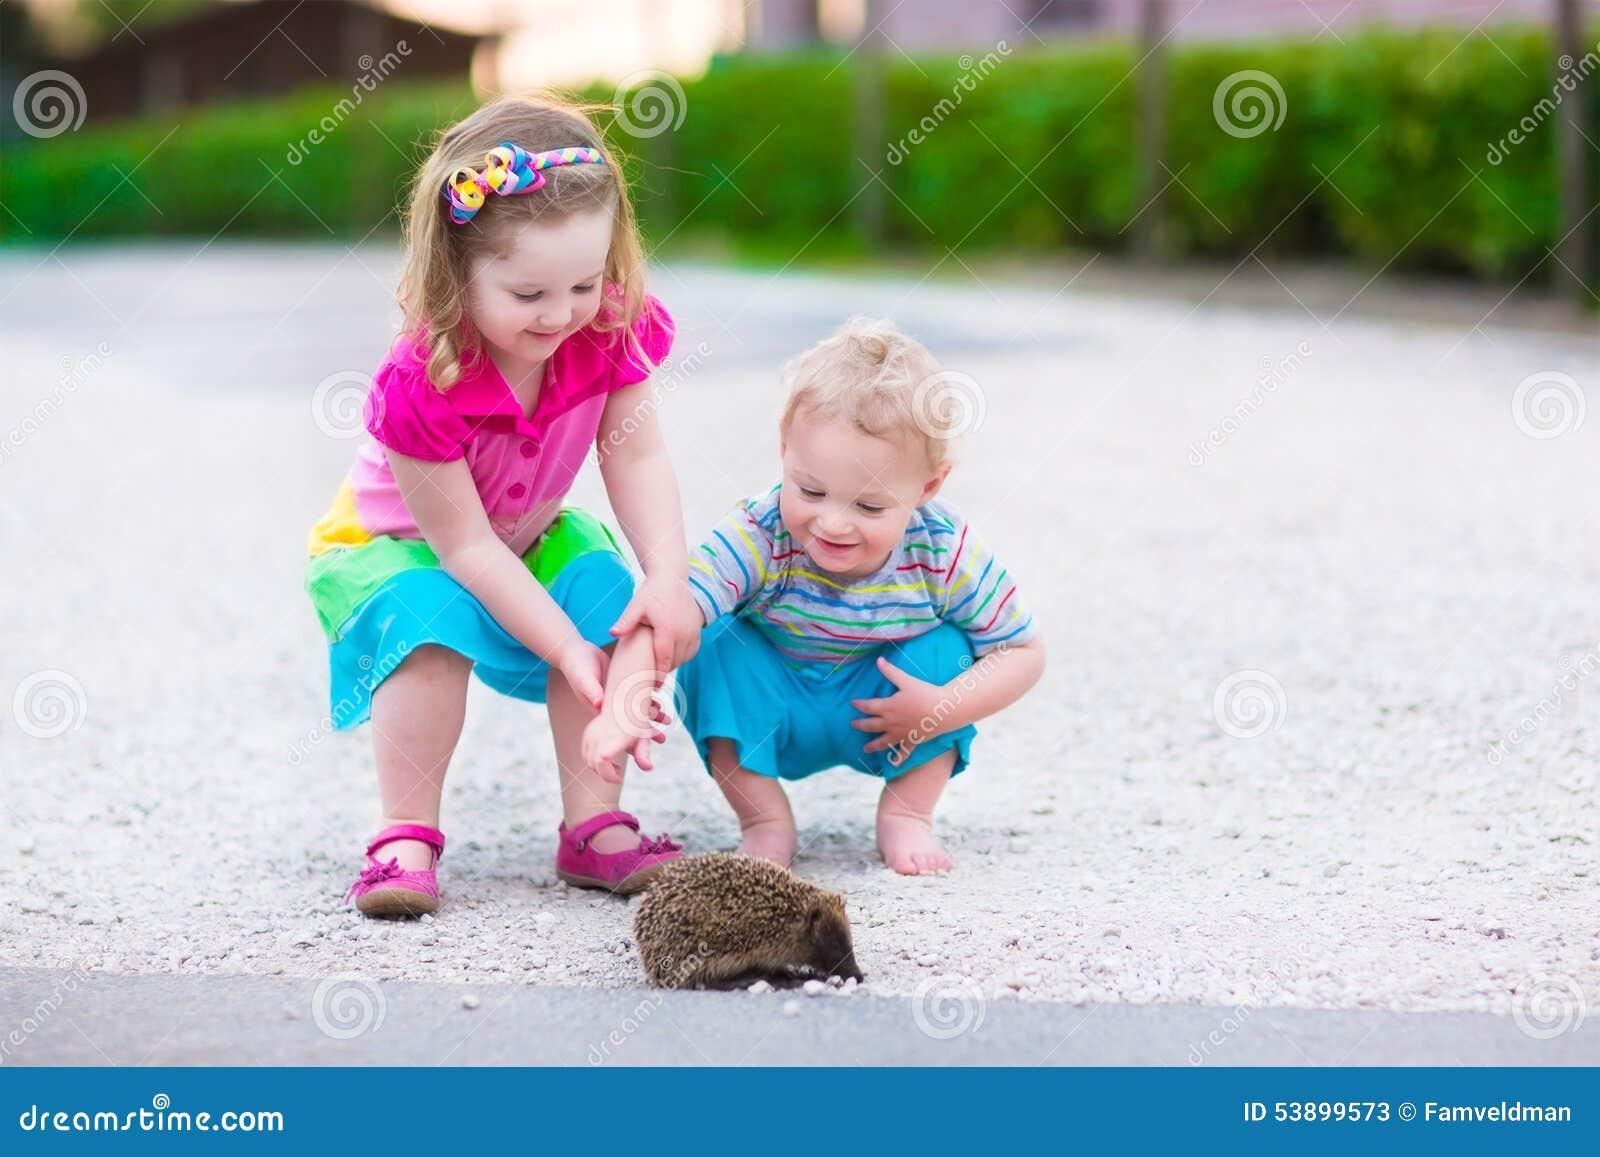 Two kids watching a hedgehog